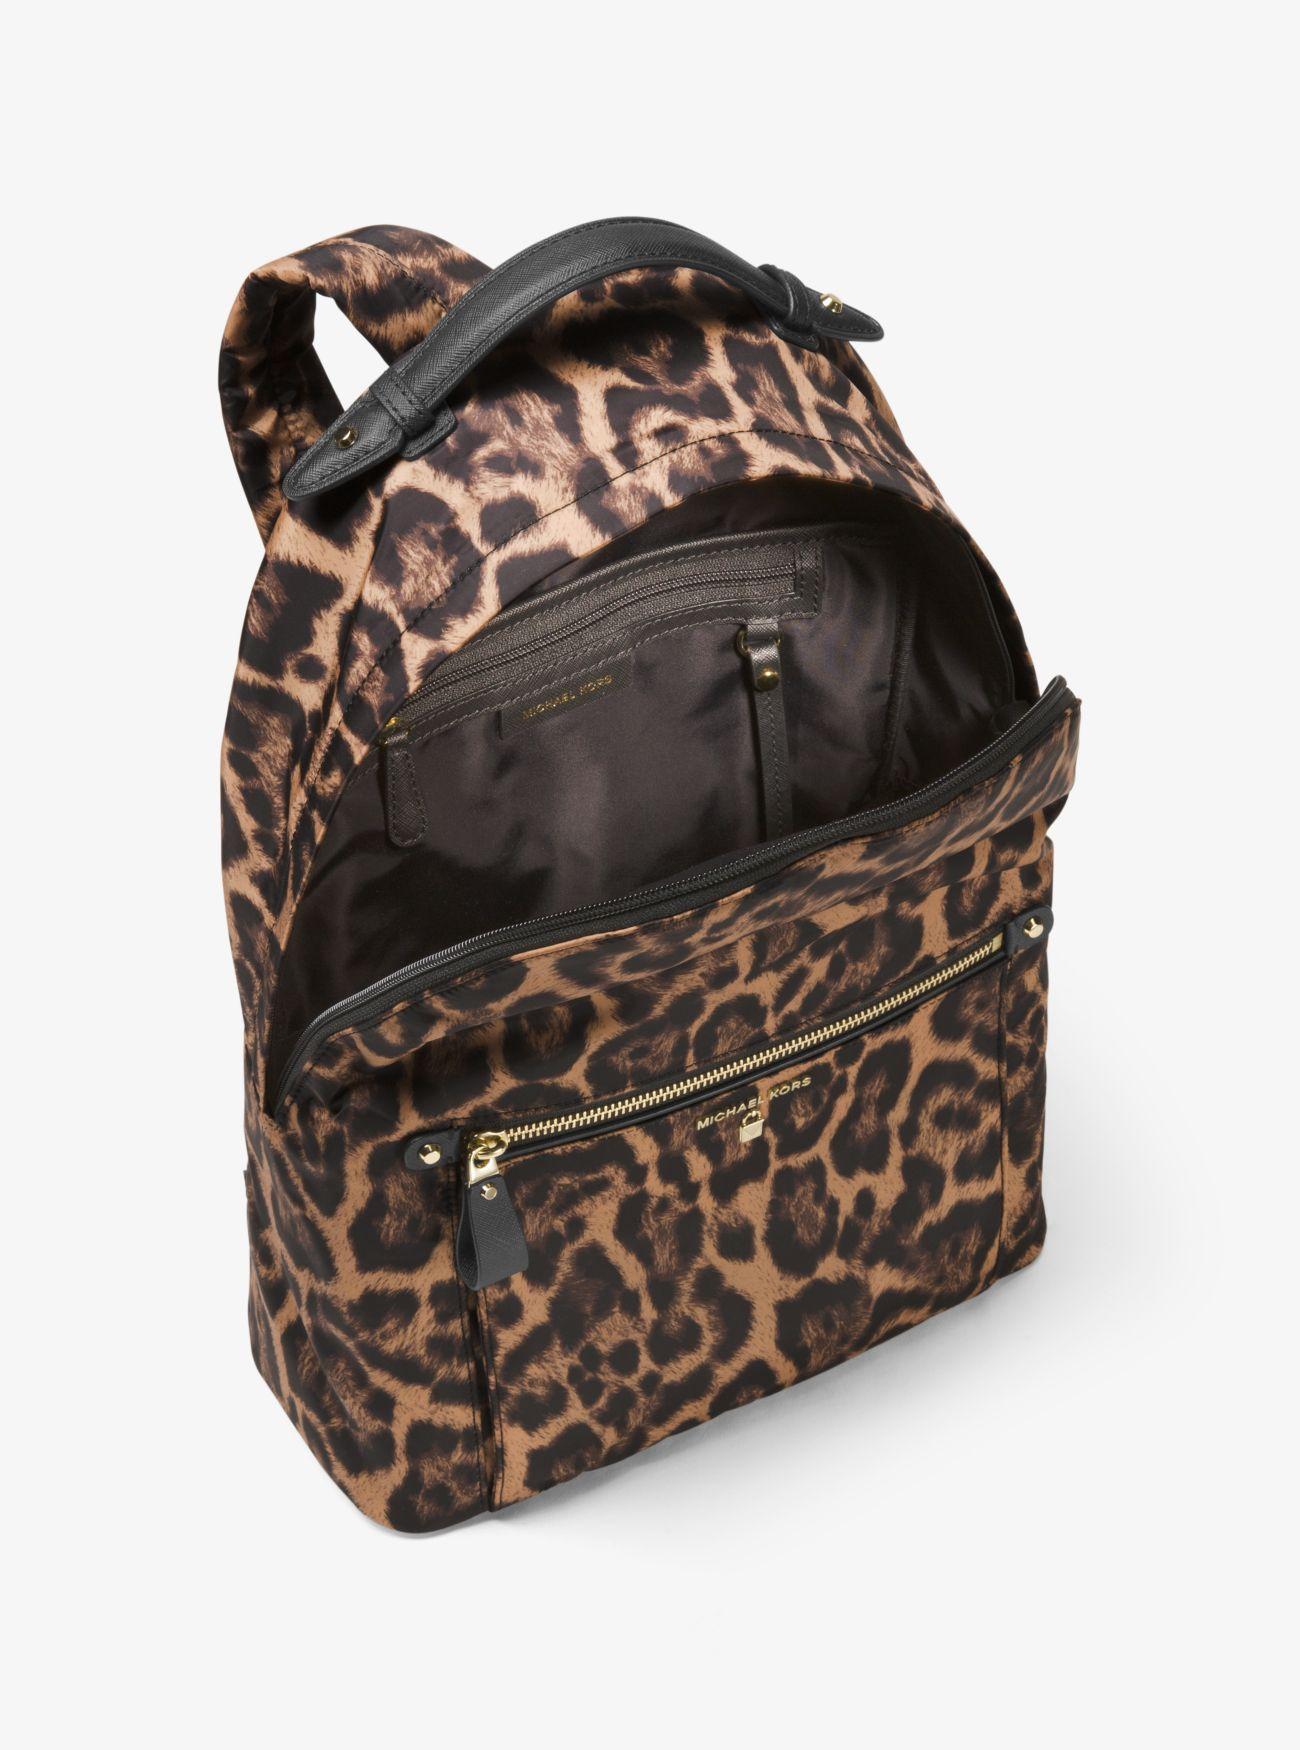 2399ac542003ee Michael Kors Kelsey Leopard Nylon Backpack - Lyst